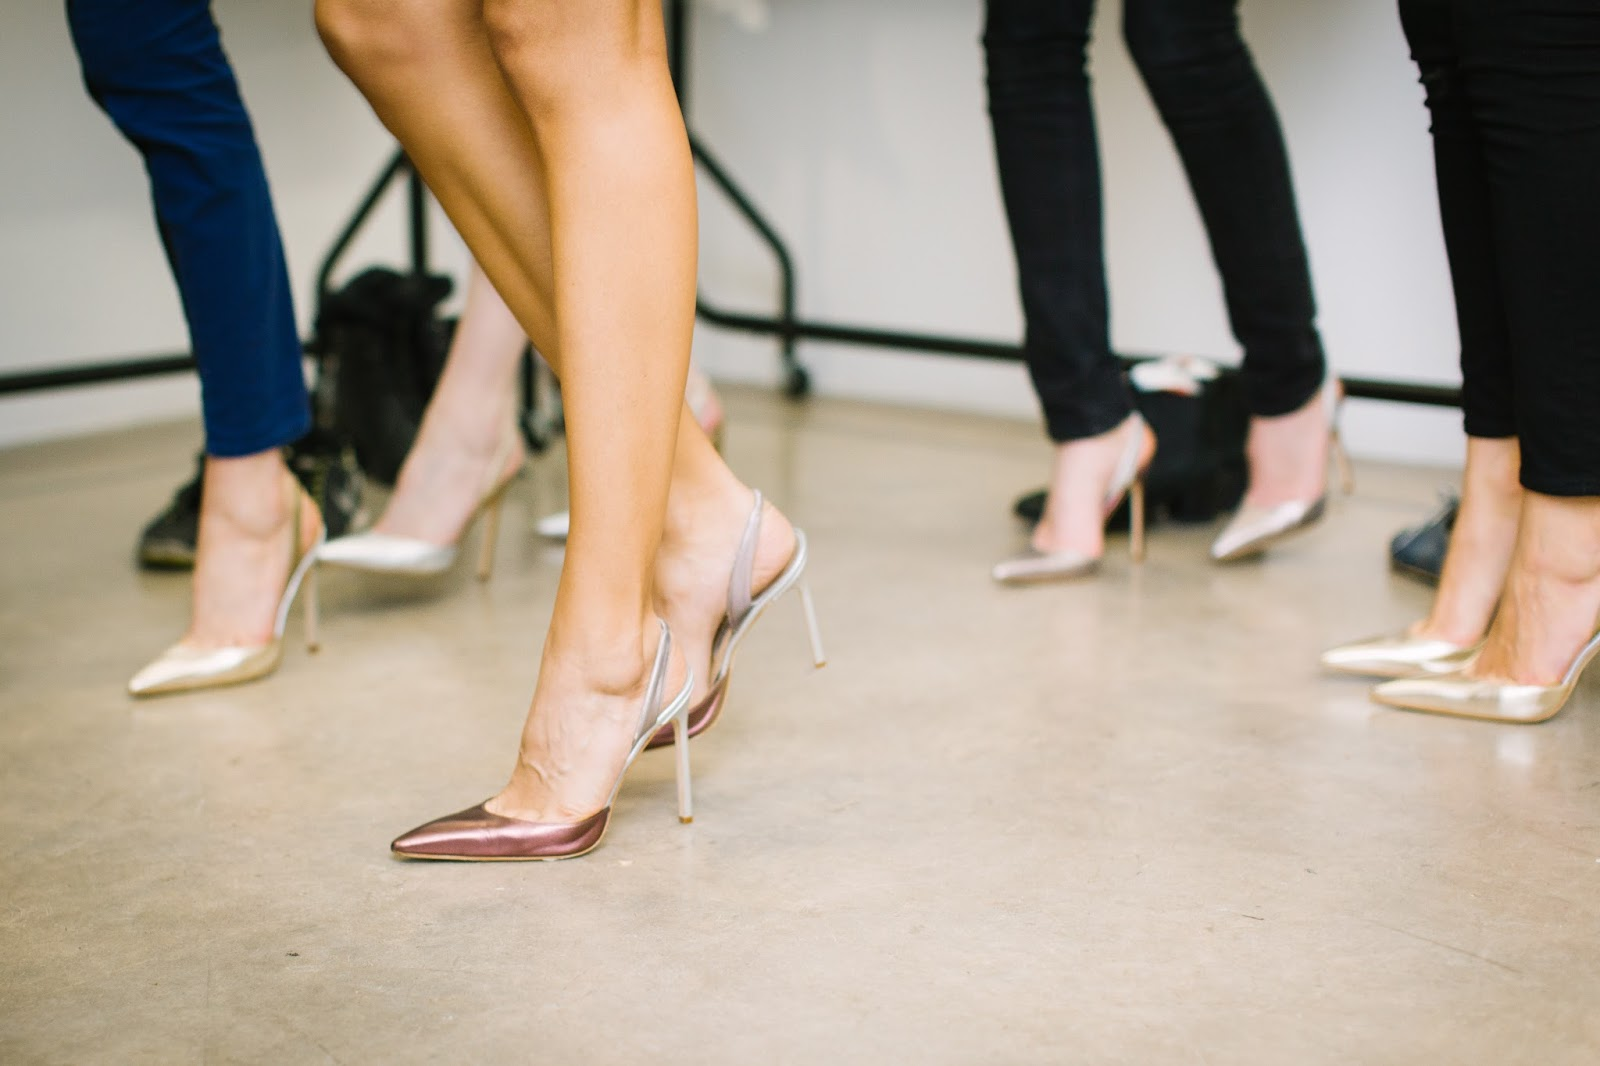 buty szpilki studniówka blog